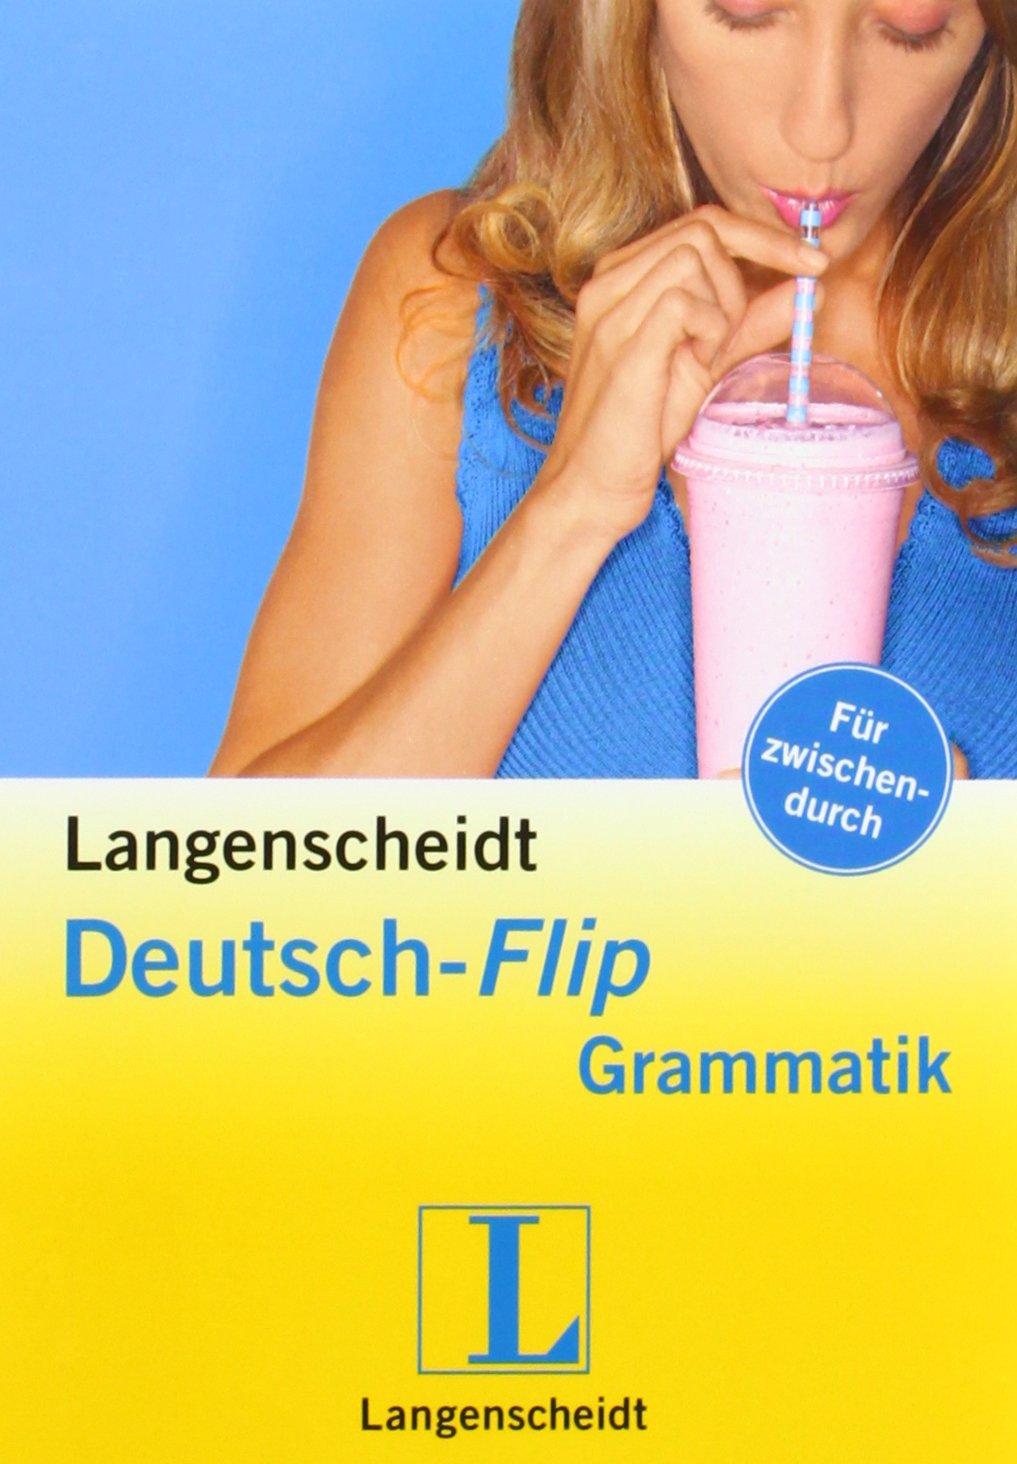 Langenscheidt Deutsch-Flip Grammatik (Langenscheidt Flip Grammatik)